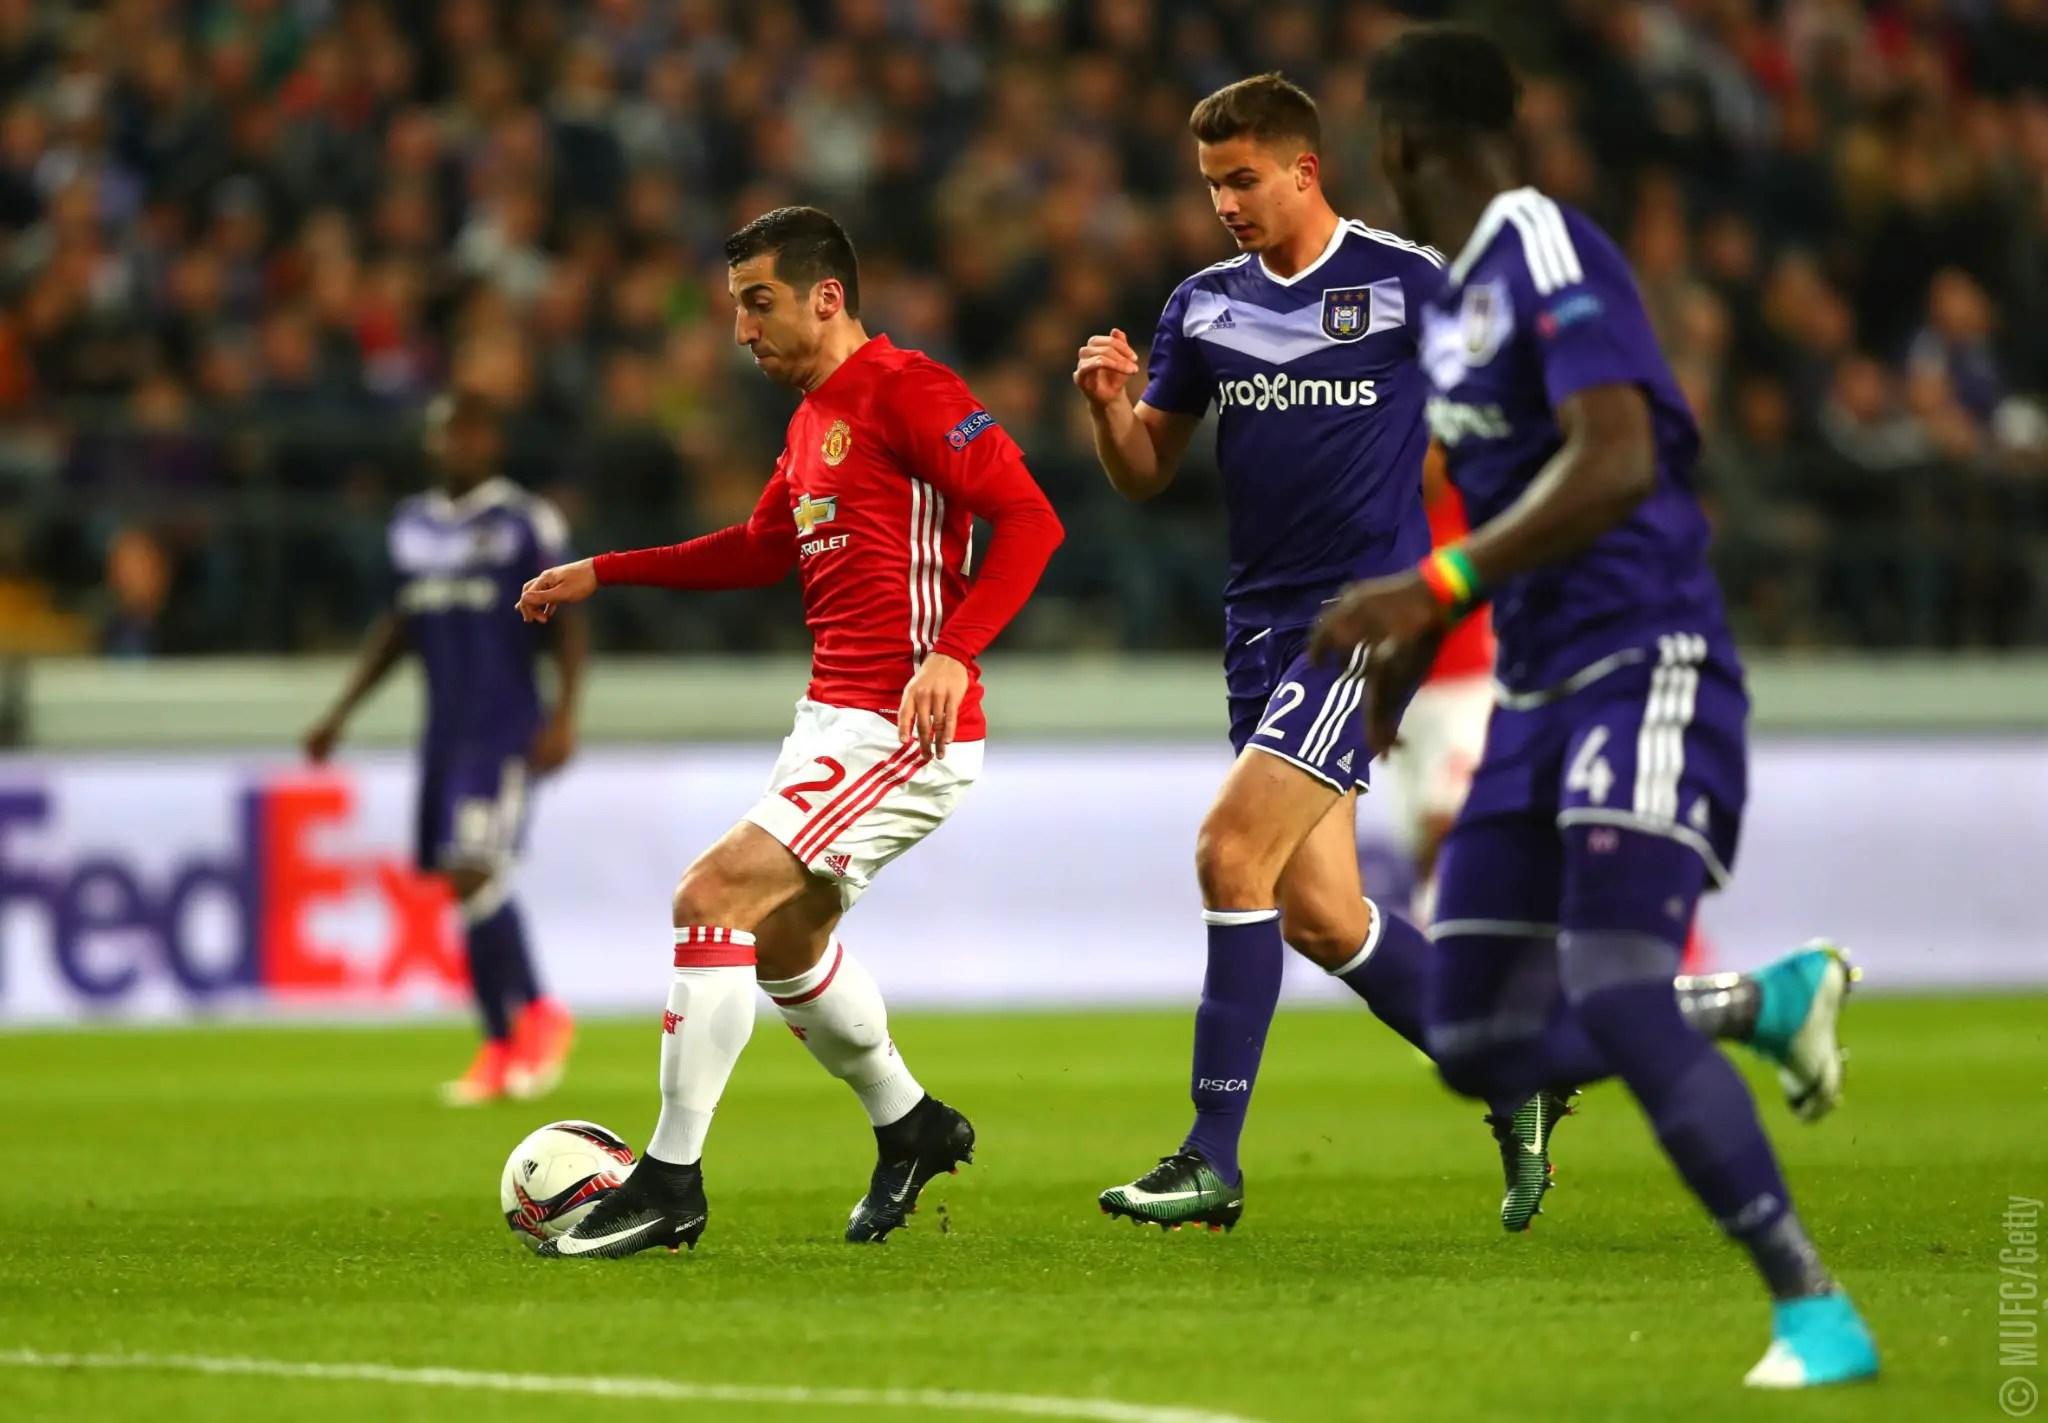 Europa League: Anderlecht Hold Man United As Celta Vigo, Ajax Win